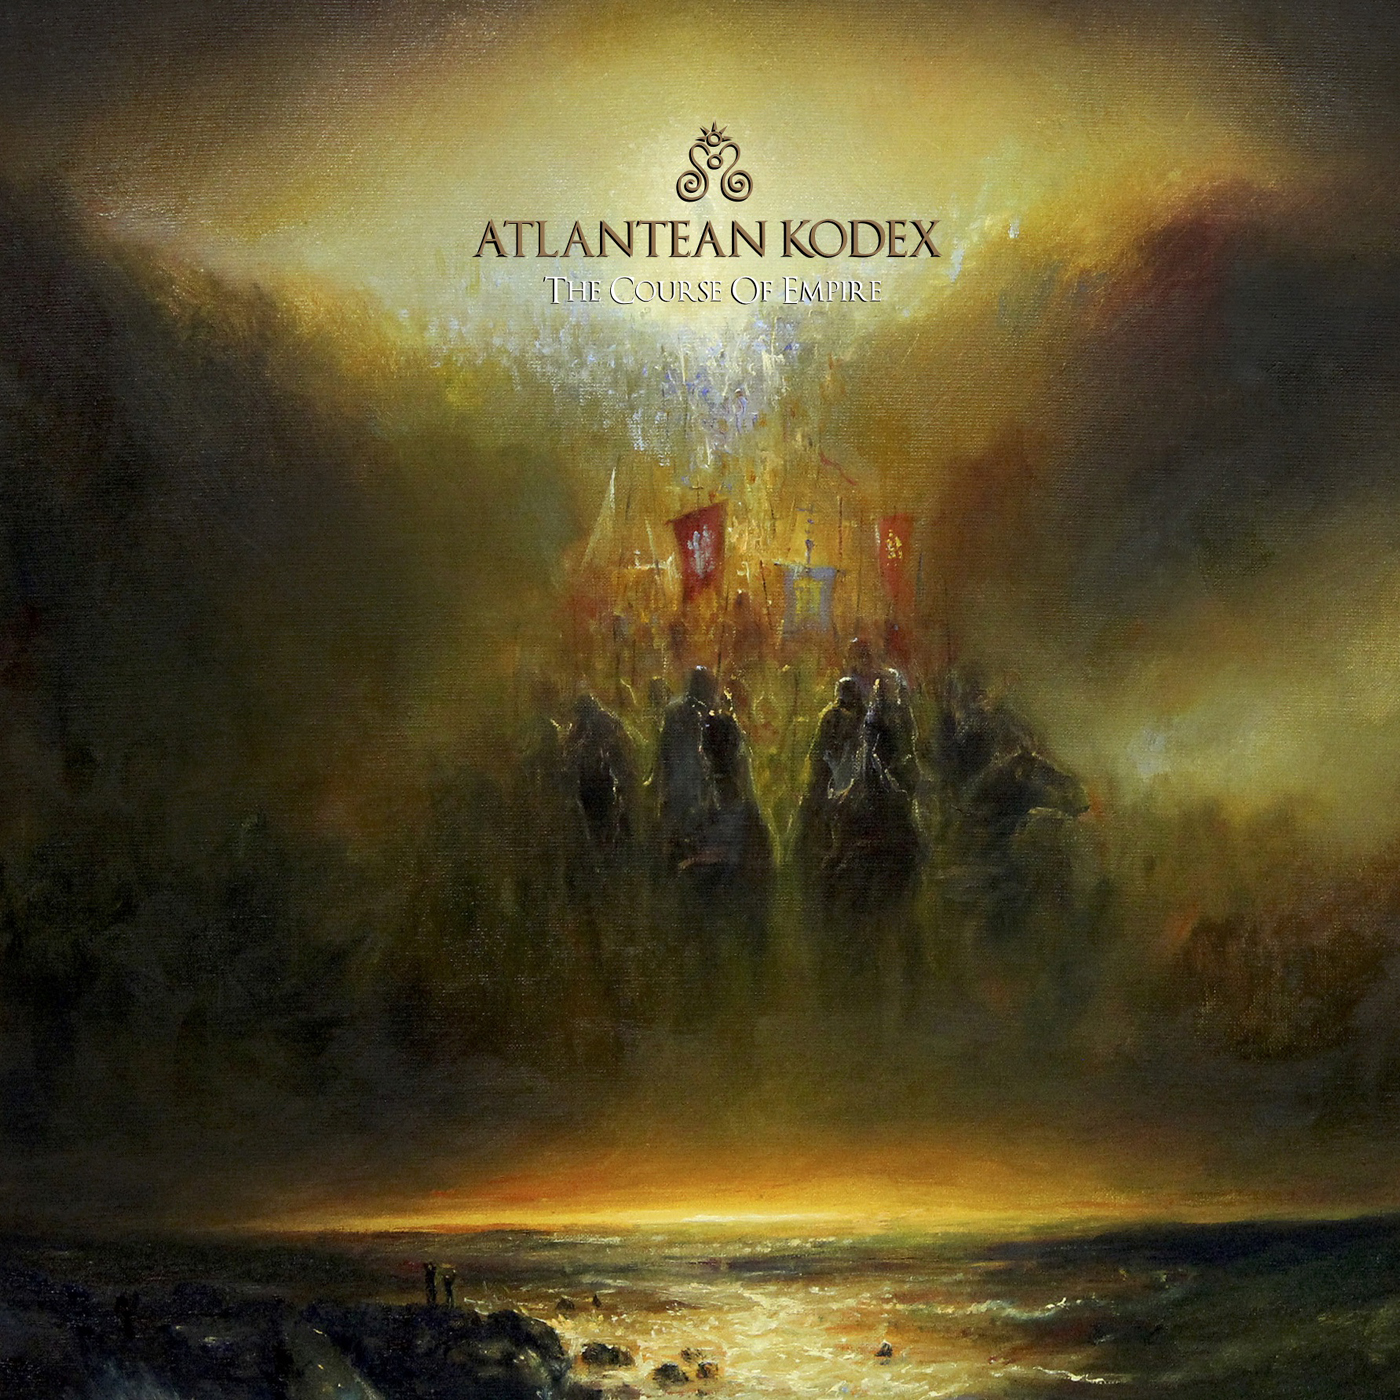 atlantean-kodex-the-course-of-empire-monumentalwerk-album-review